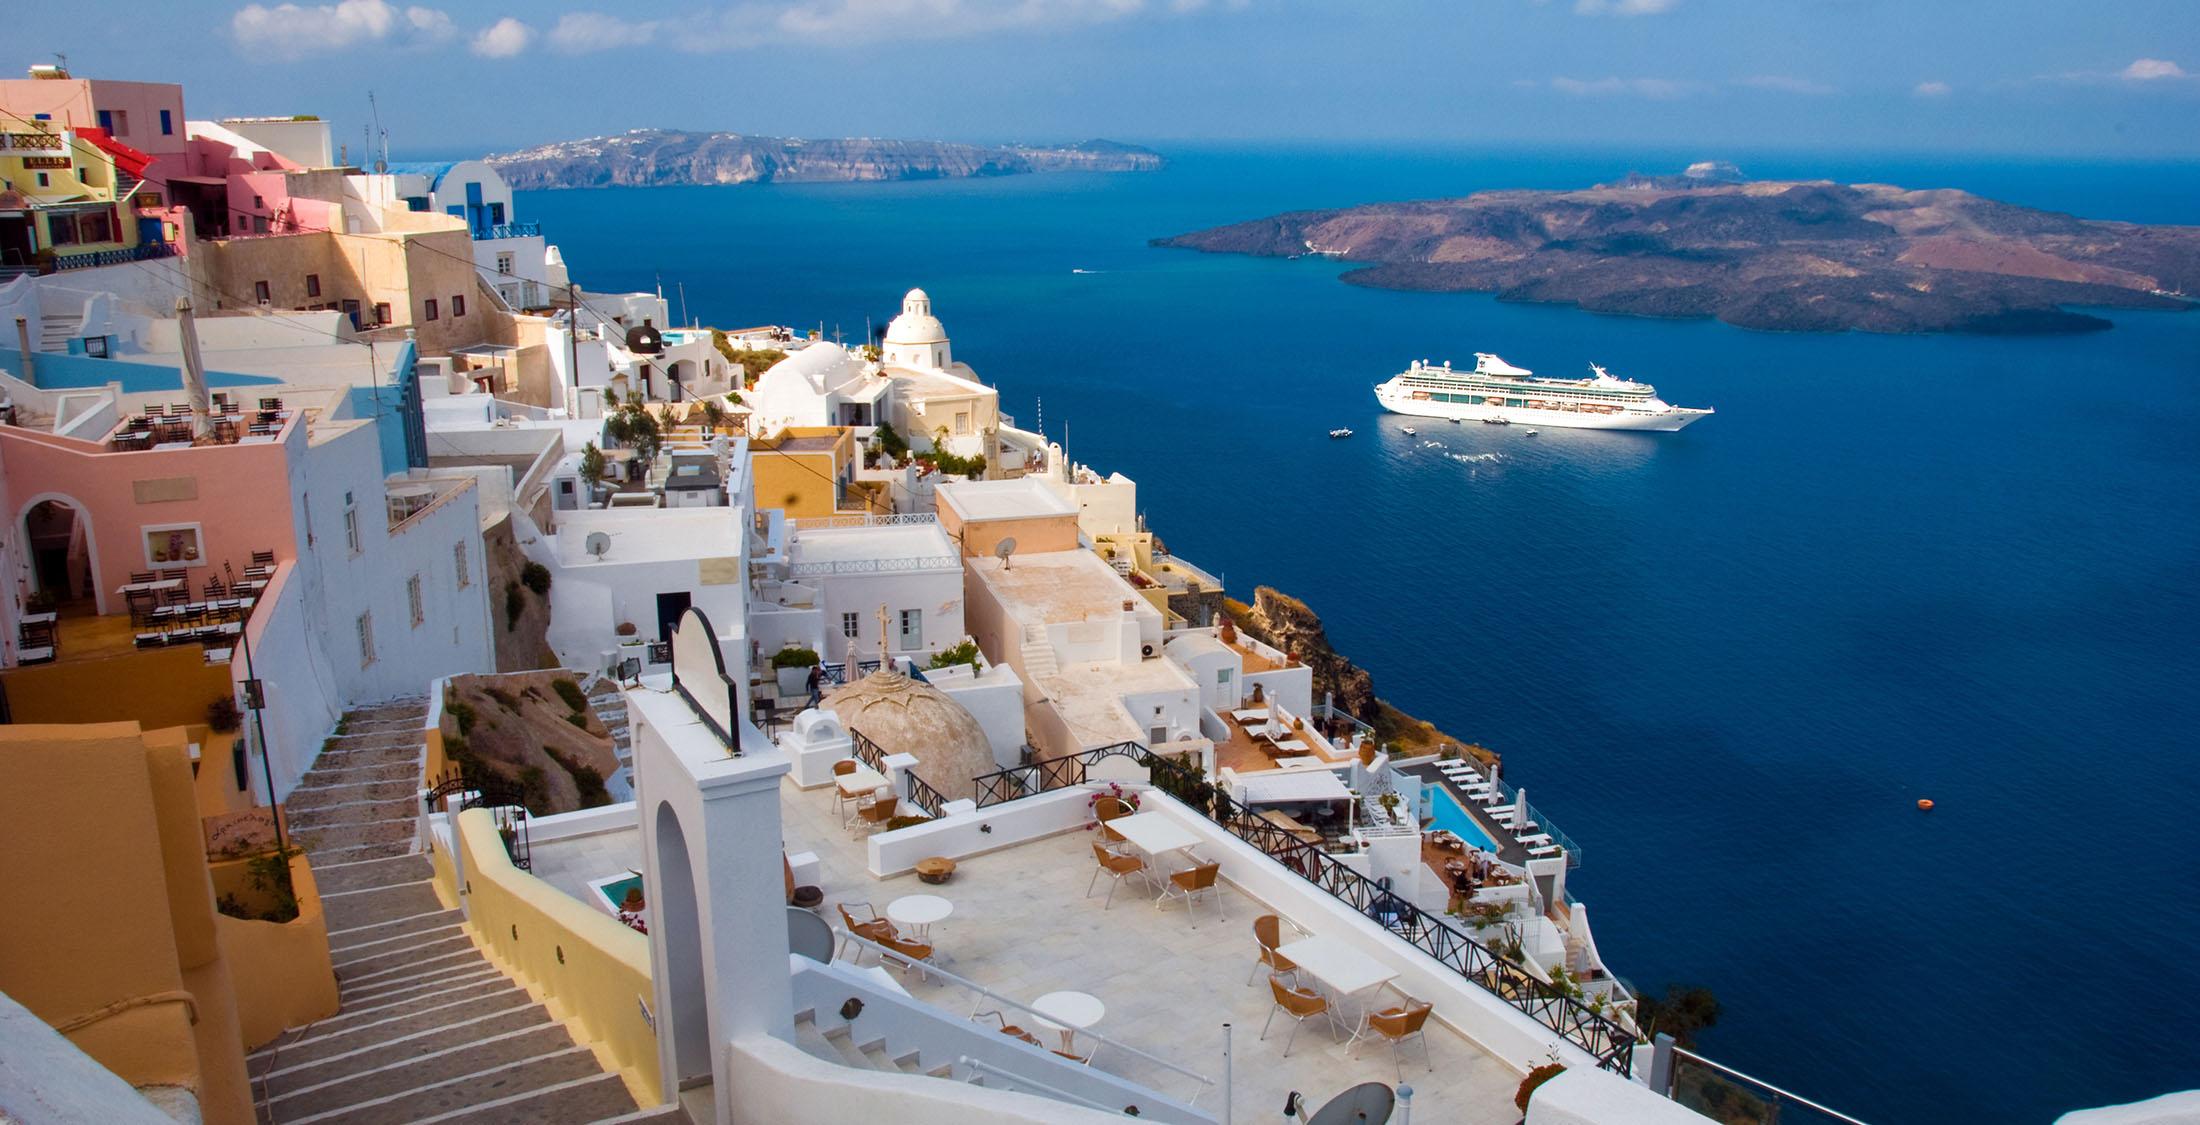 Mediterranean town overlooking the sea